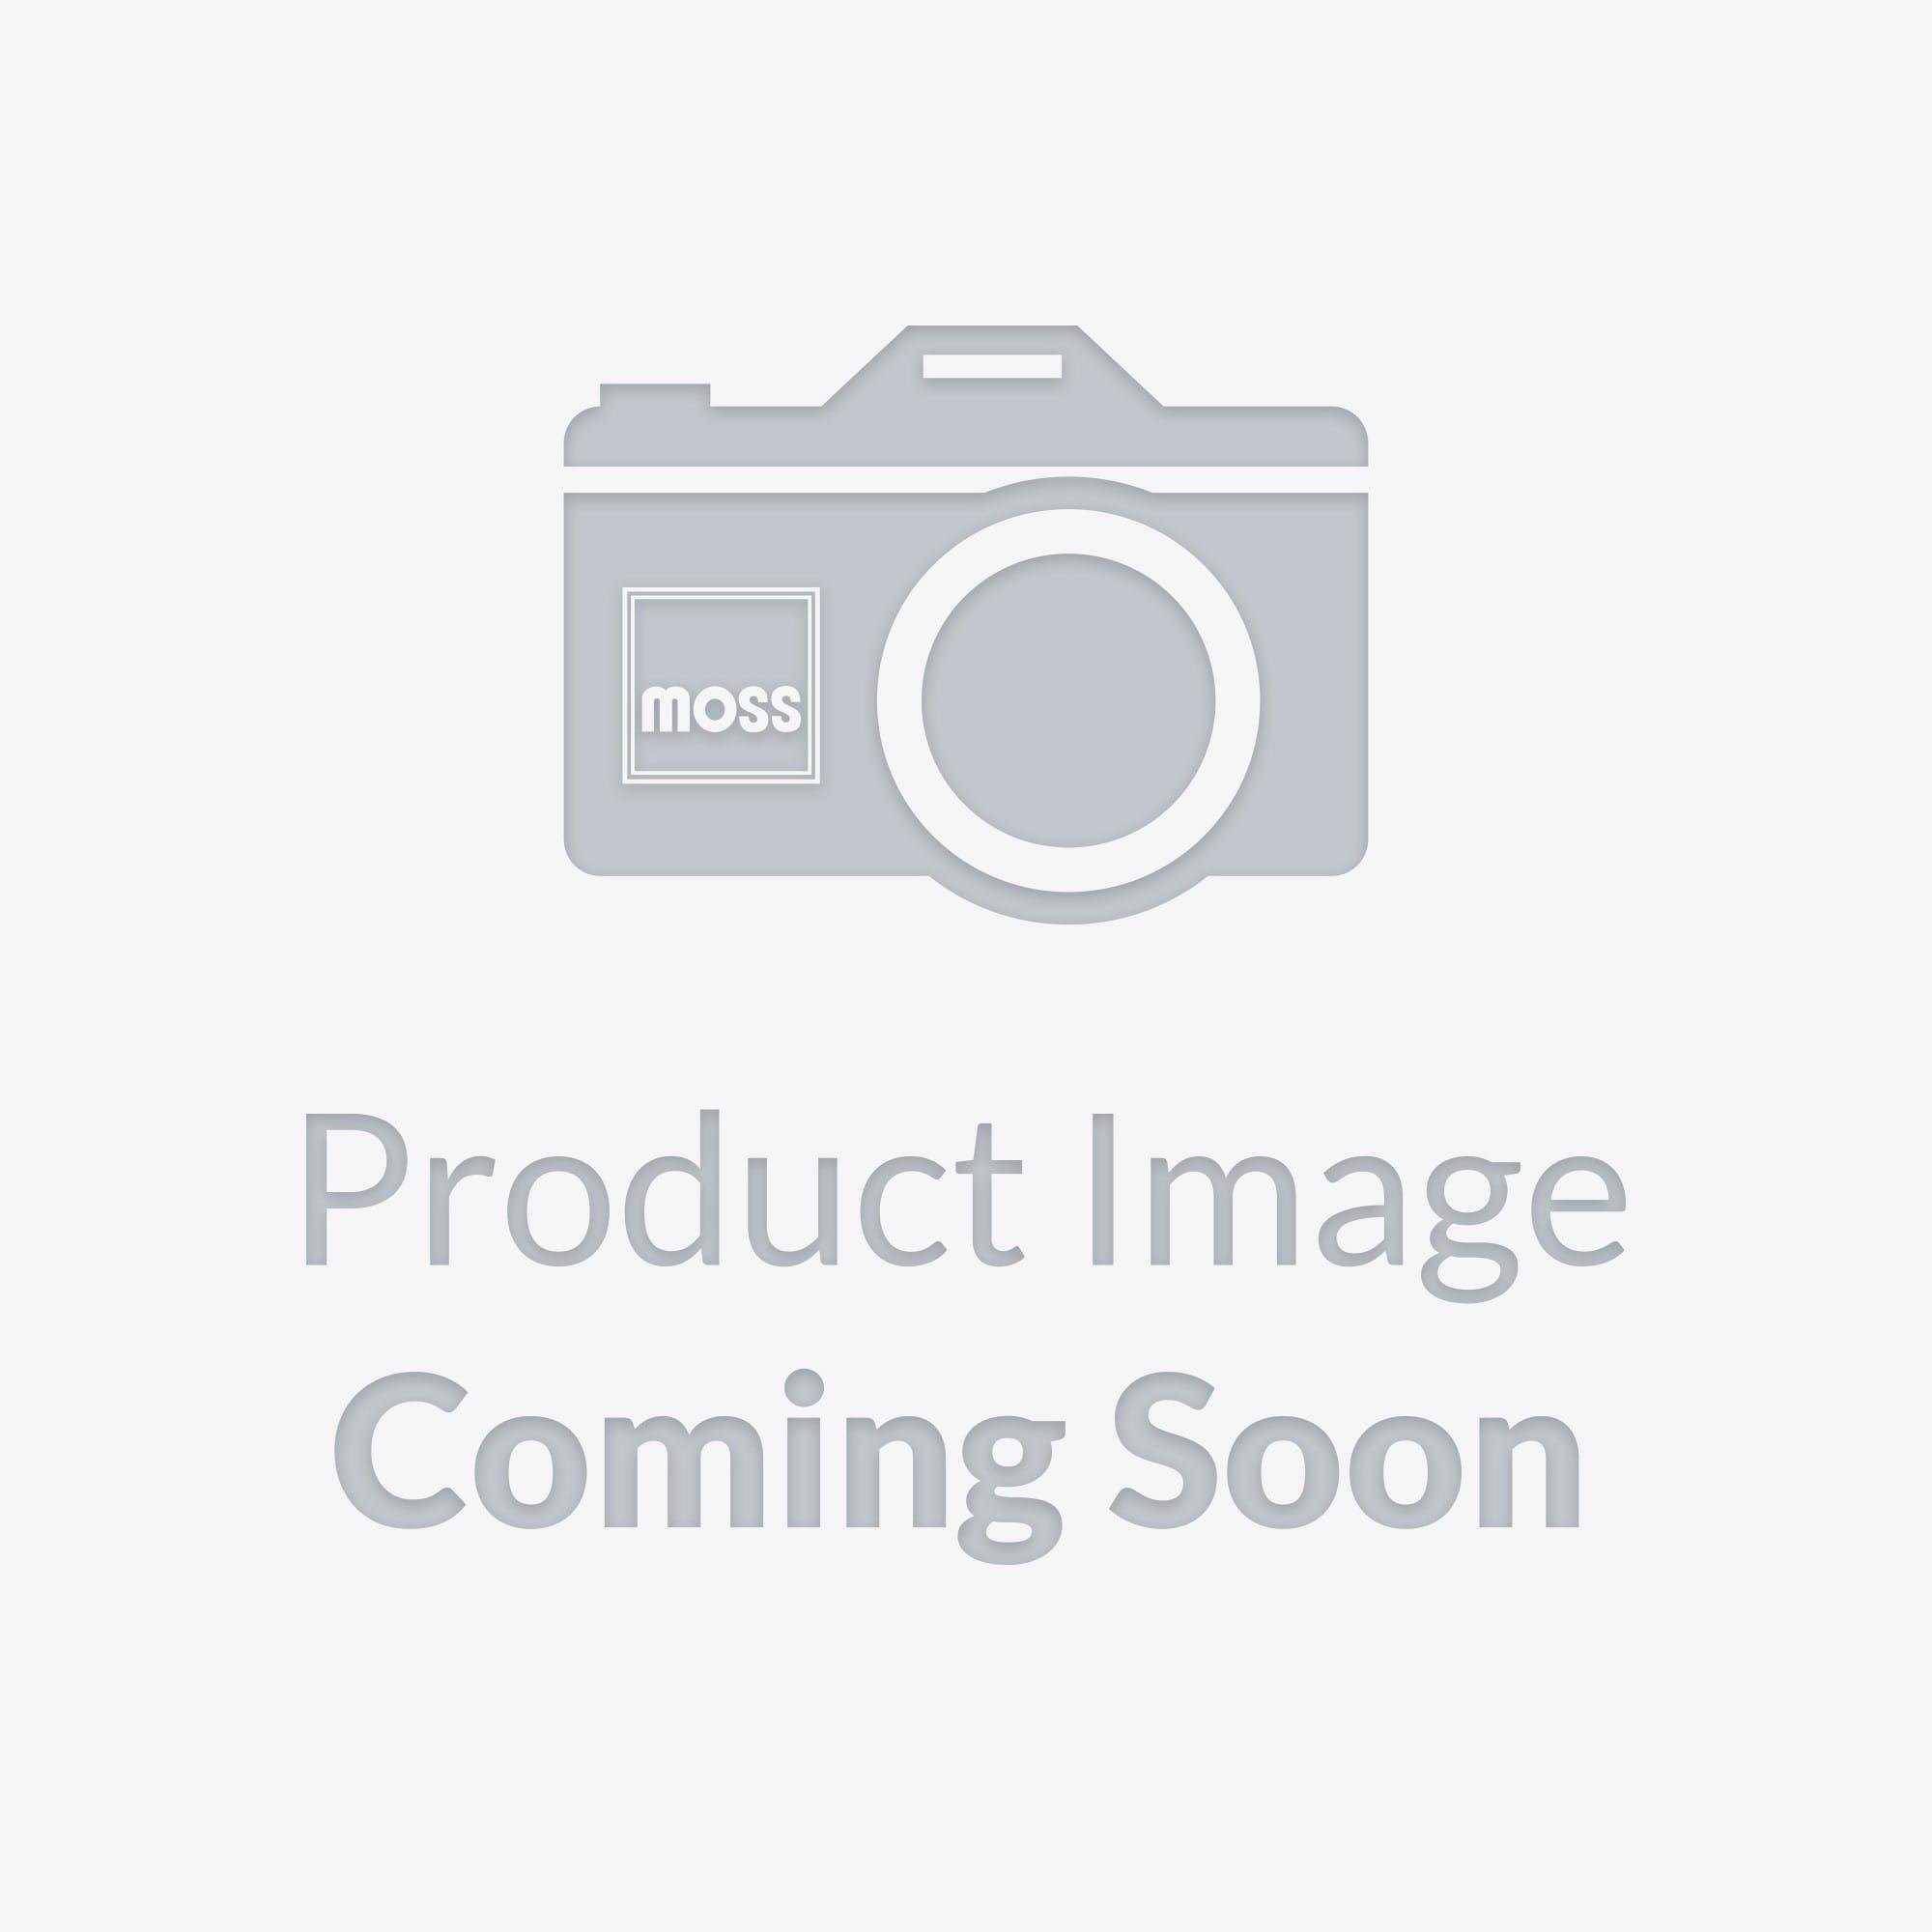 Vintage Look Reproduction 1968 MG Midget Metal Sign